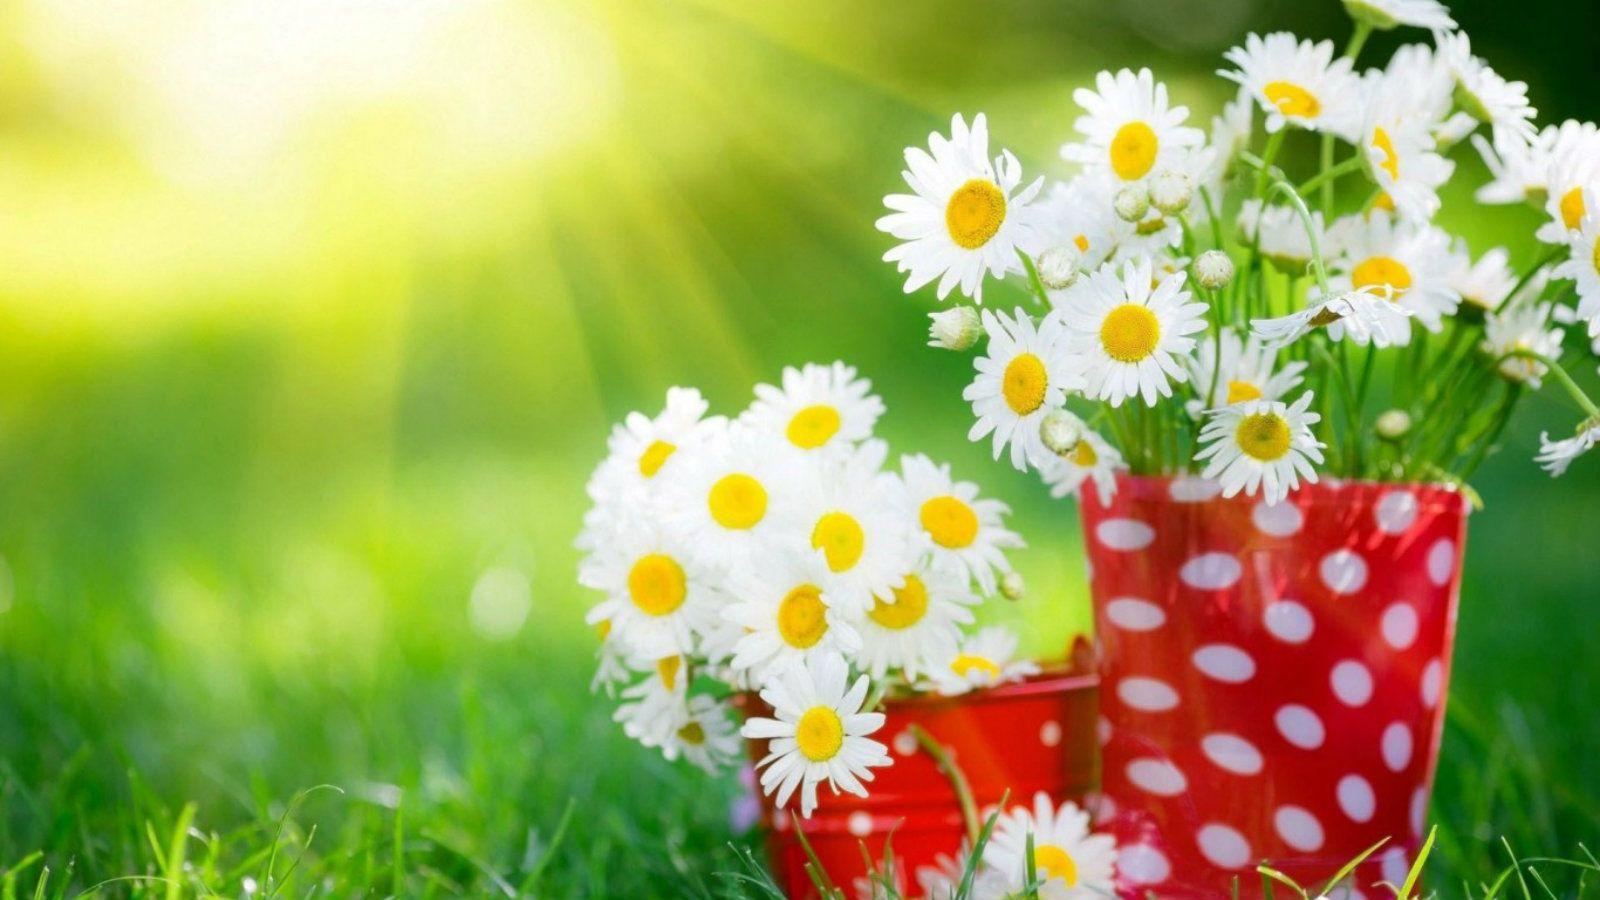 Most beautiful white flowers free hd wallpapers elsoar hd most beautiful white flowers free hd wallpapers elsoar izmirmasajfo